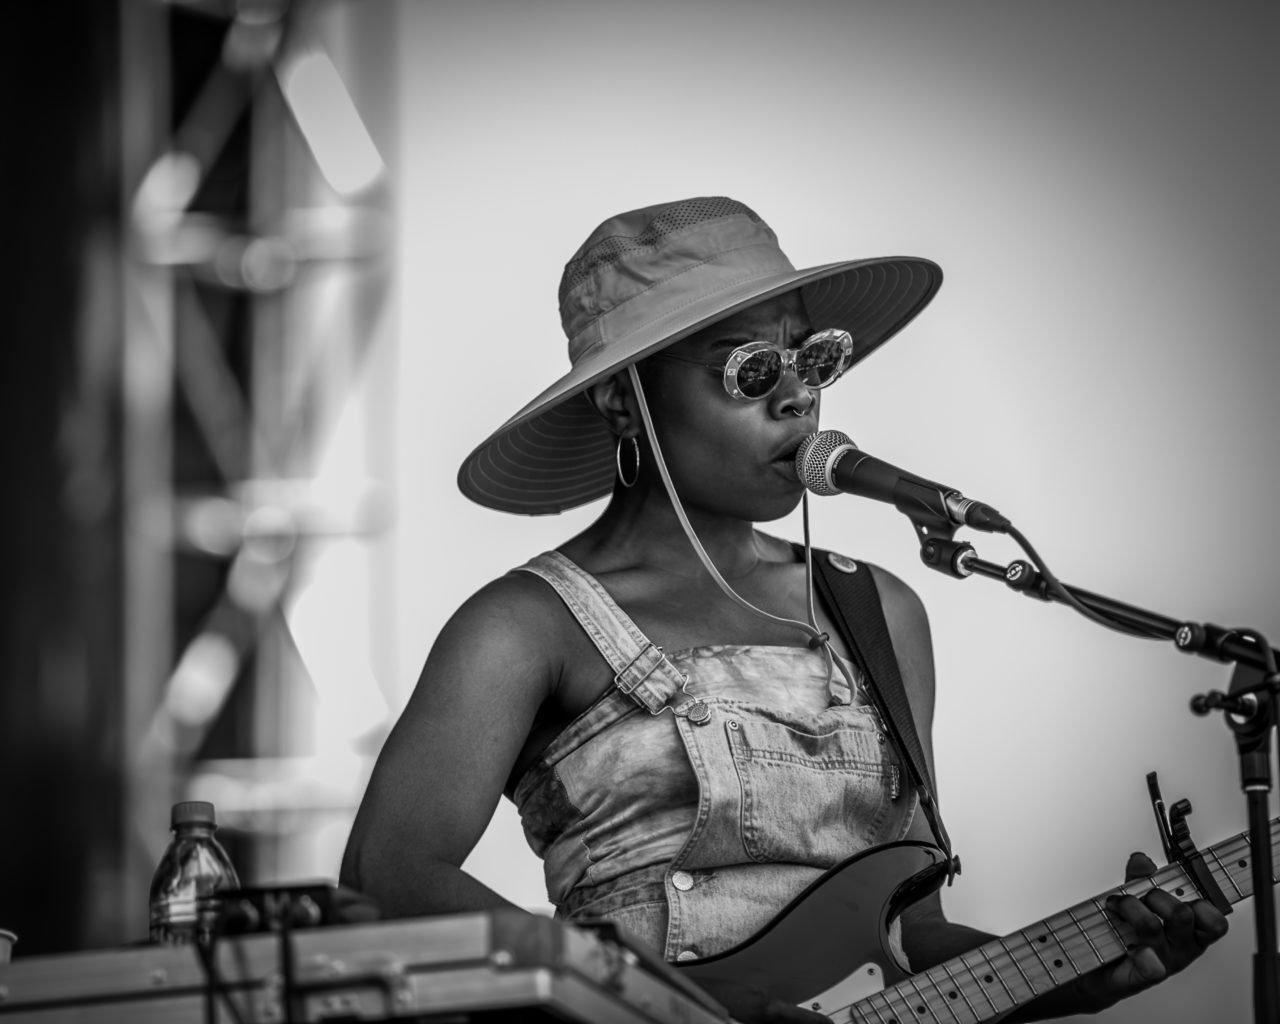 Vagabon performing at 80/35 Music Festival 2018 in Des Moines, Iowa